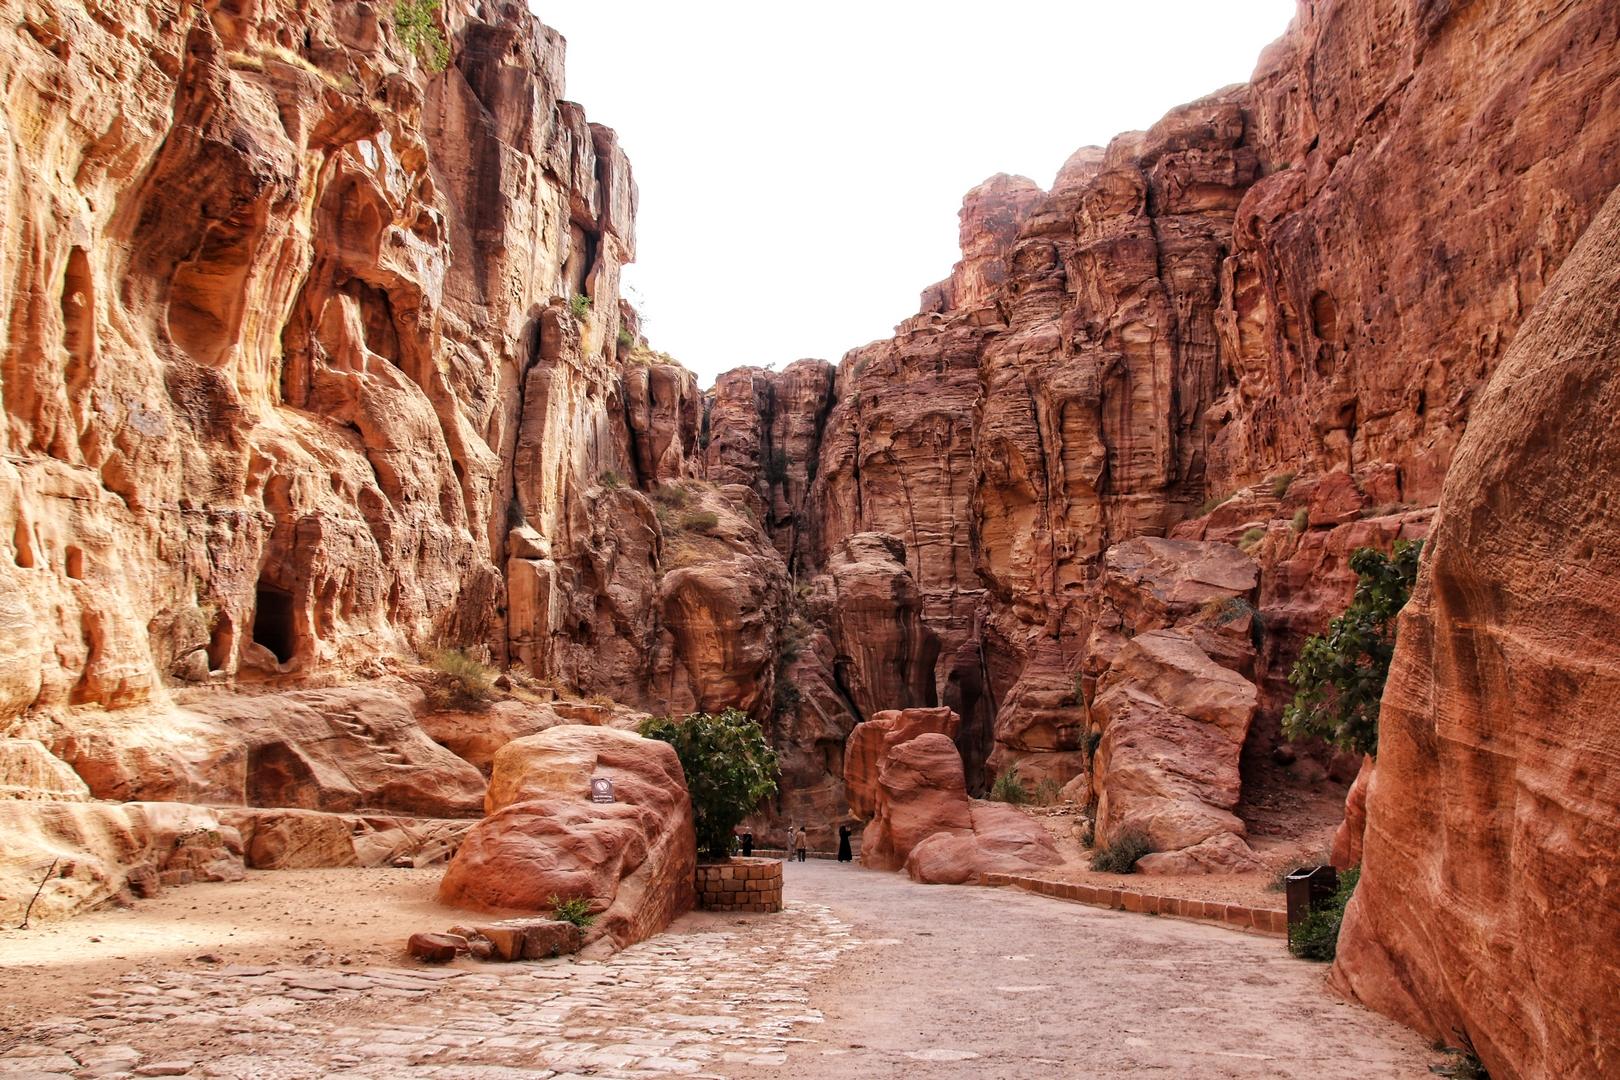 Jordanie - Siq qui mène au site de Petra